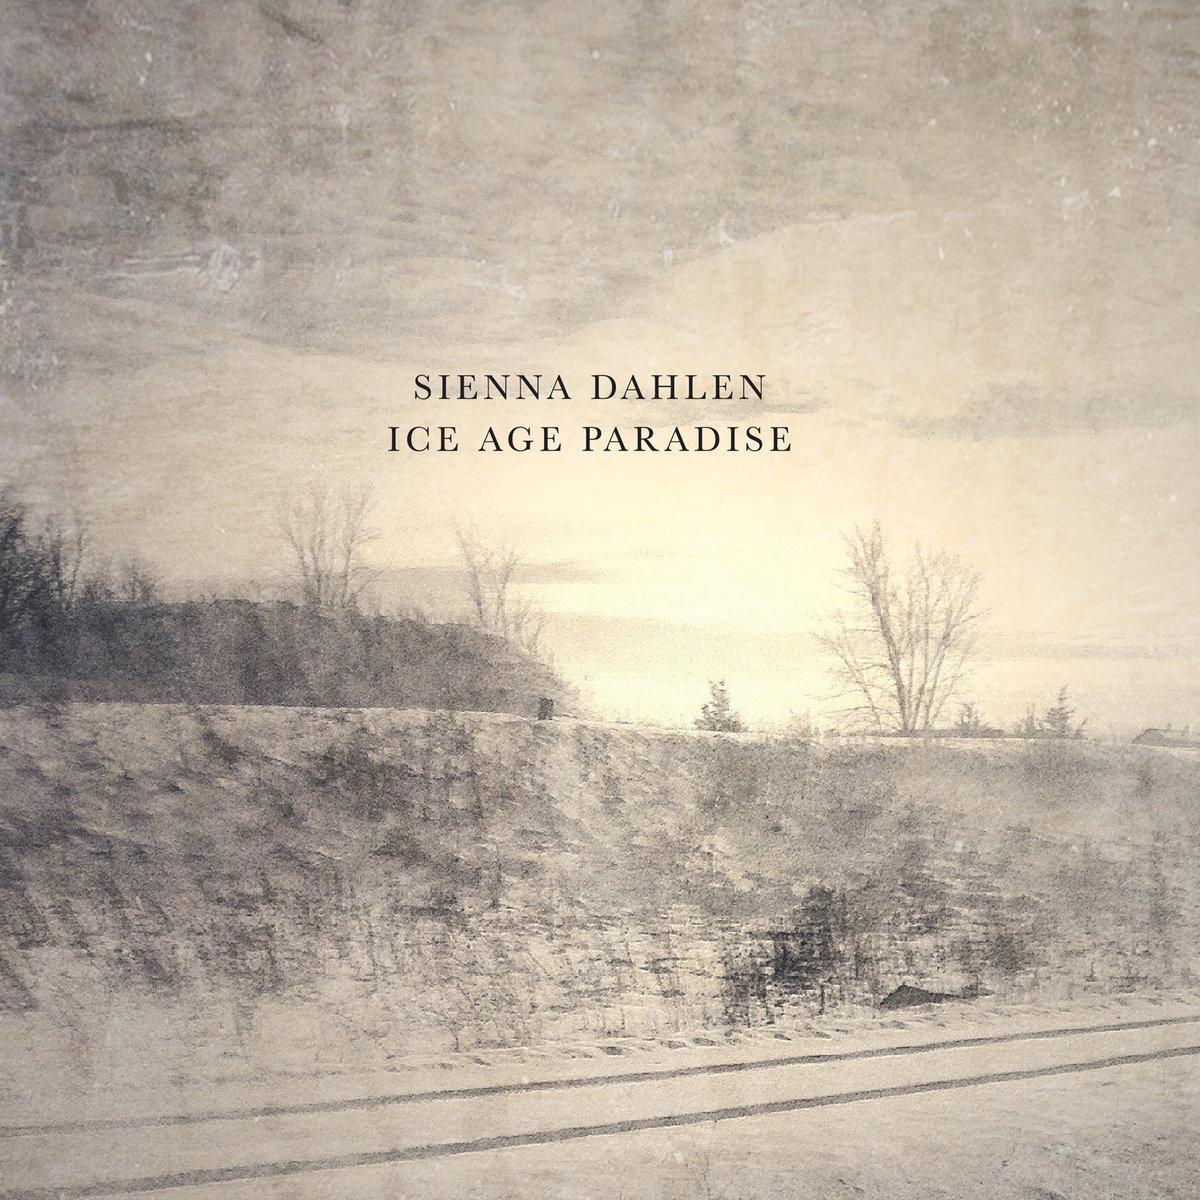 Sienna Dahlen, Ice Age Paradise